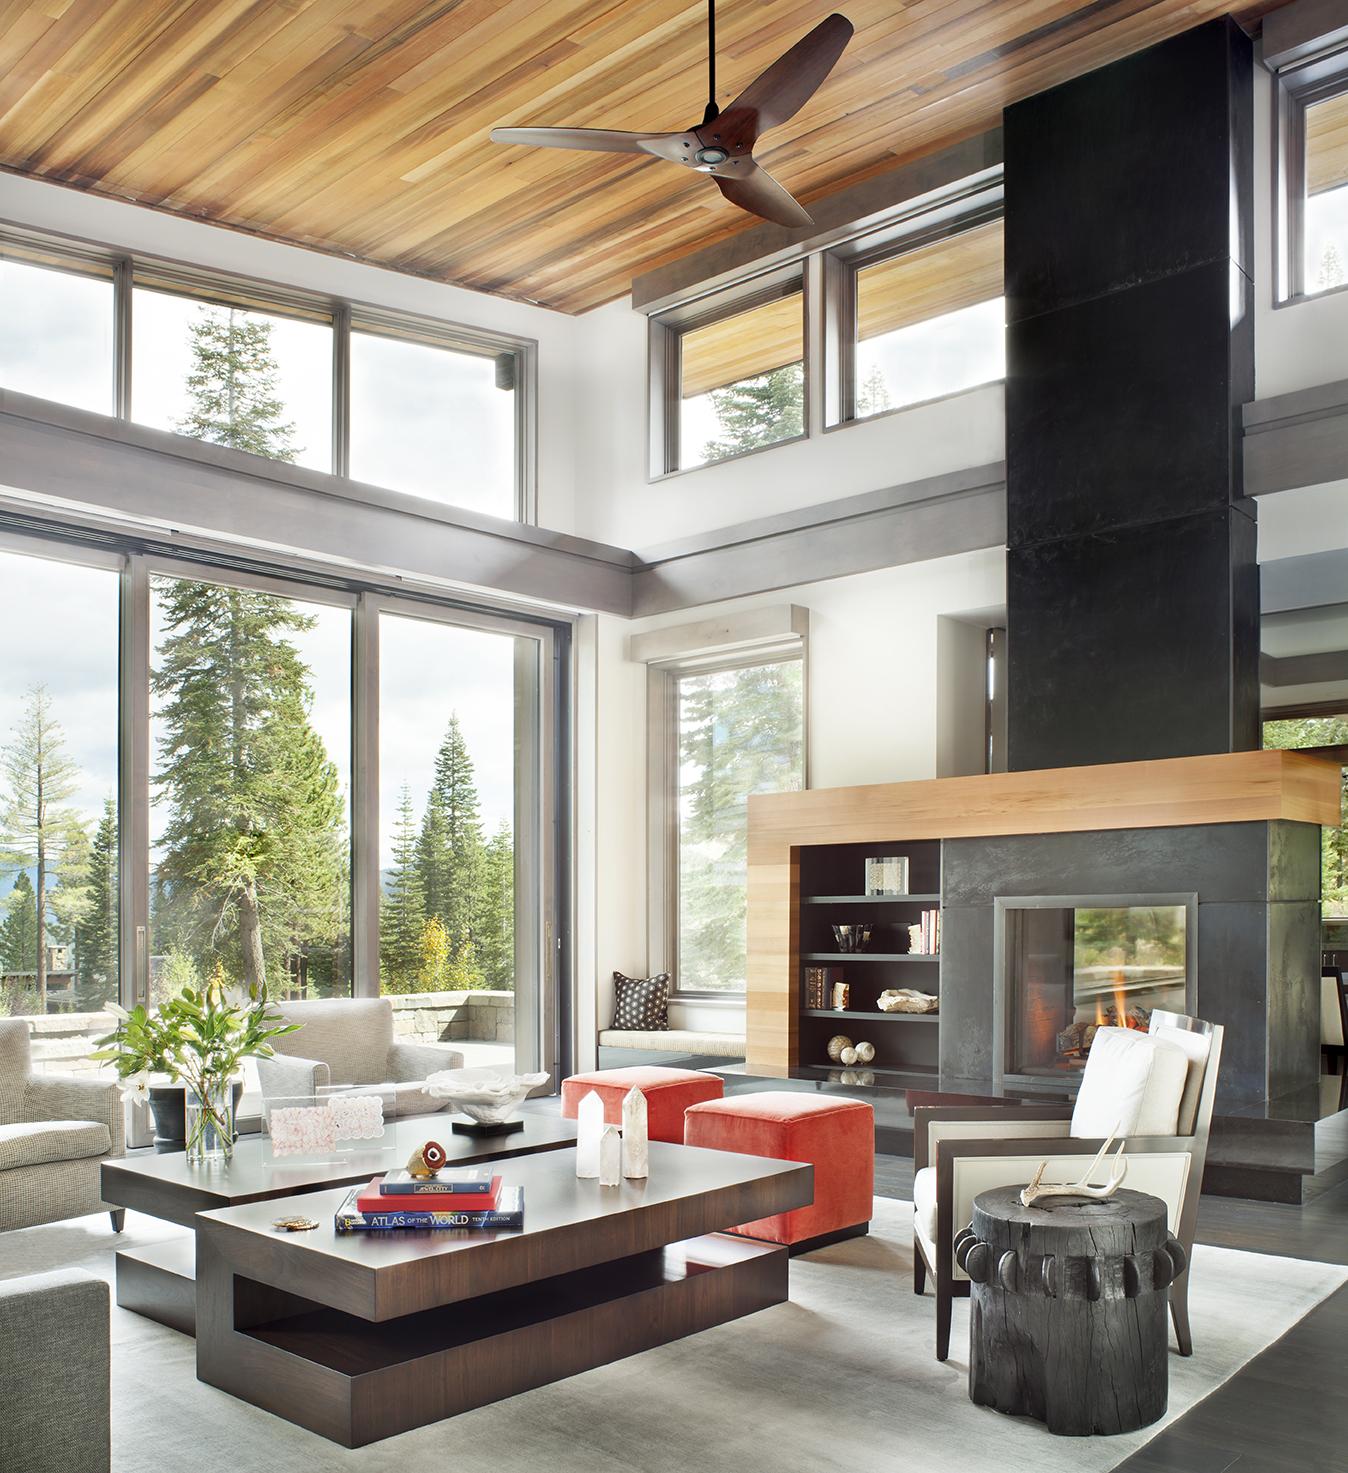 Lot 76_Living Room_Fireplace_Wood Ceiling.jpg